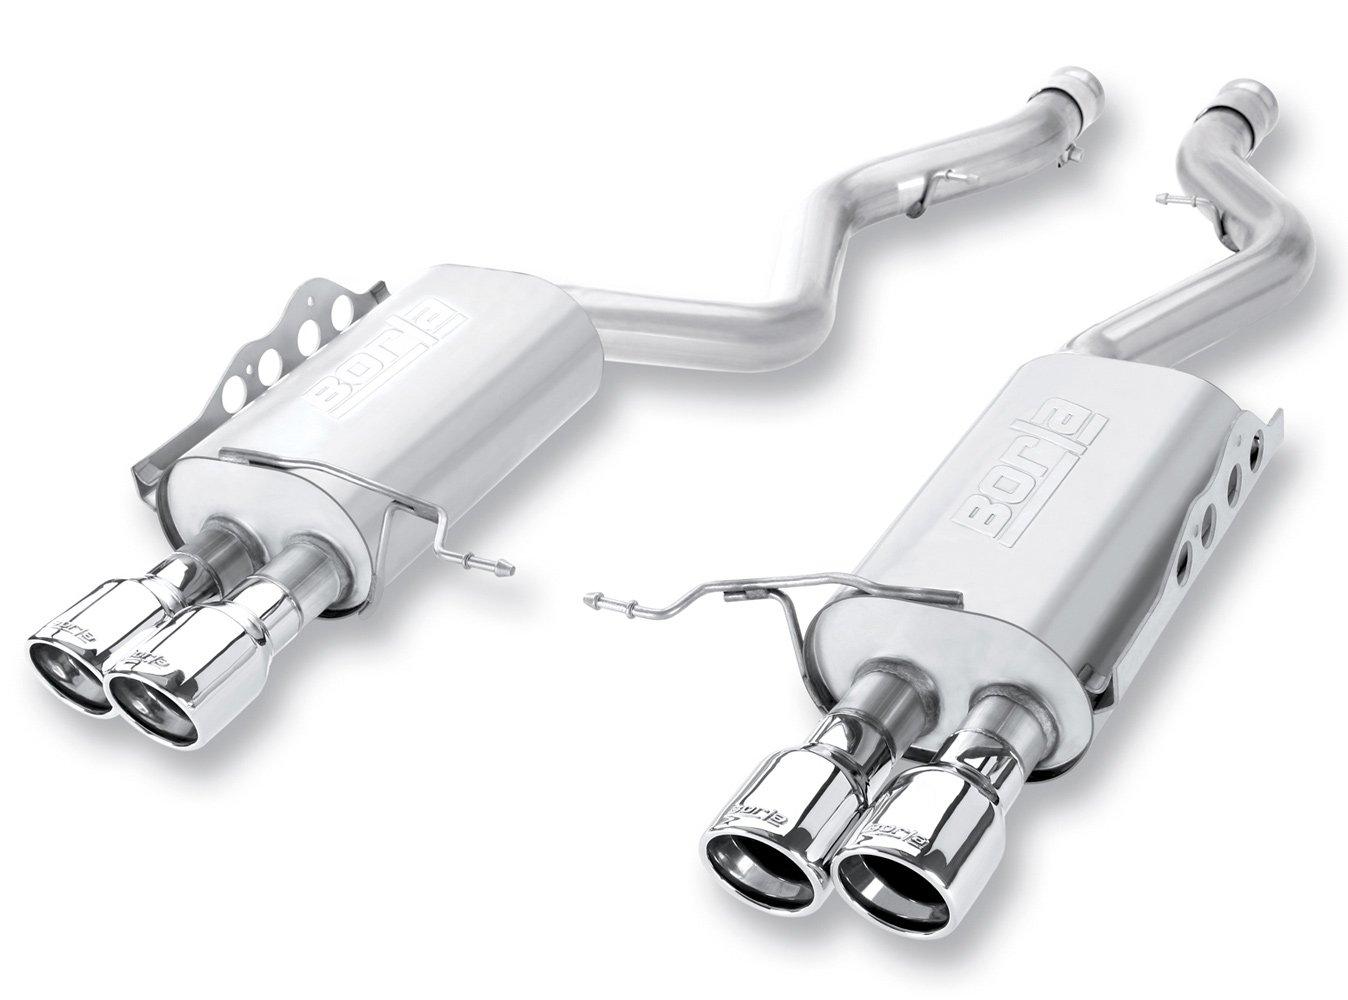 Borla Exhaust System Reviews Free Shipping